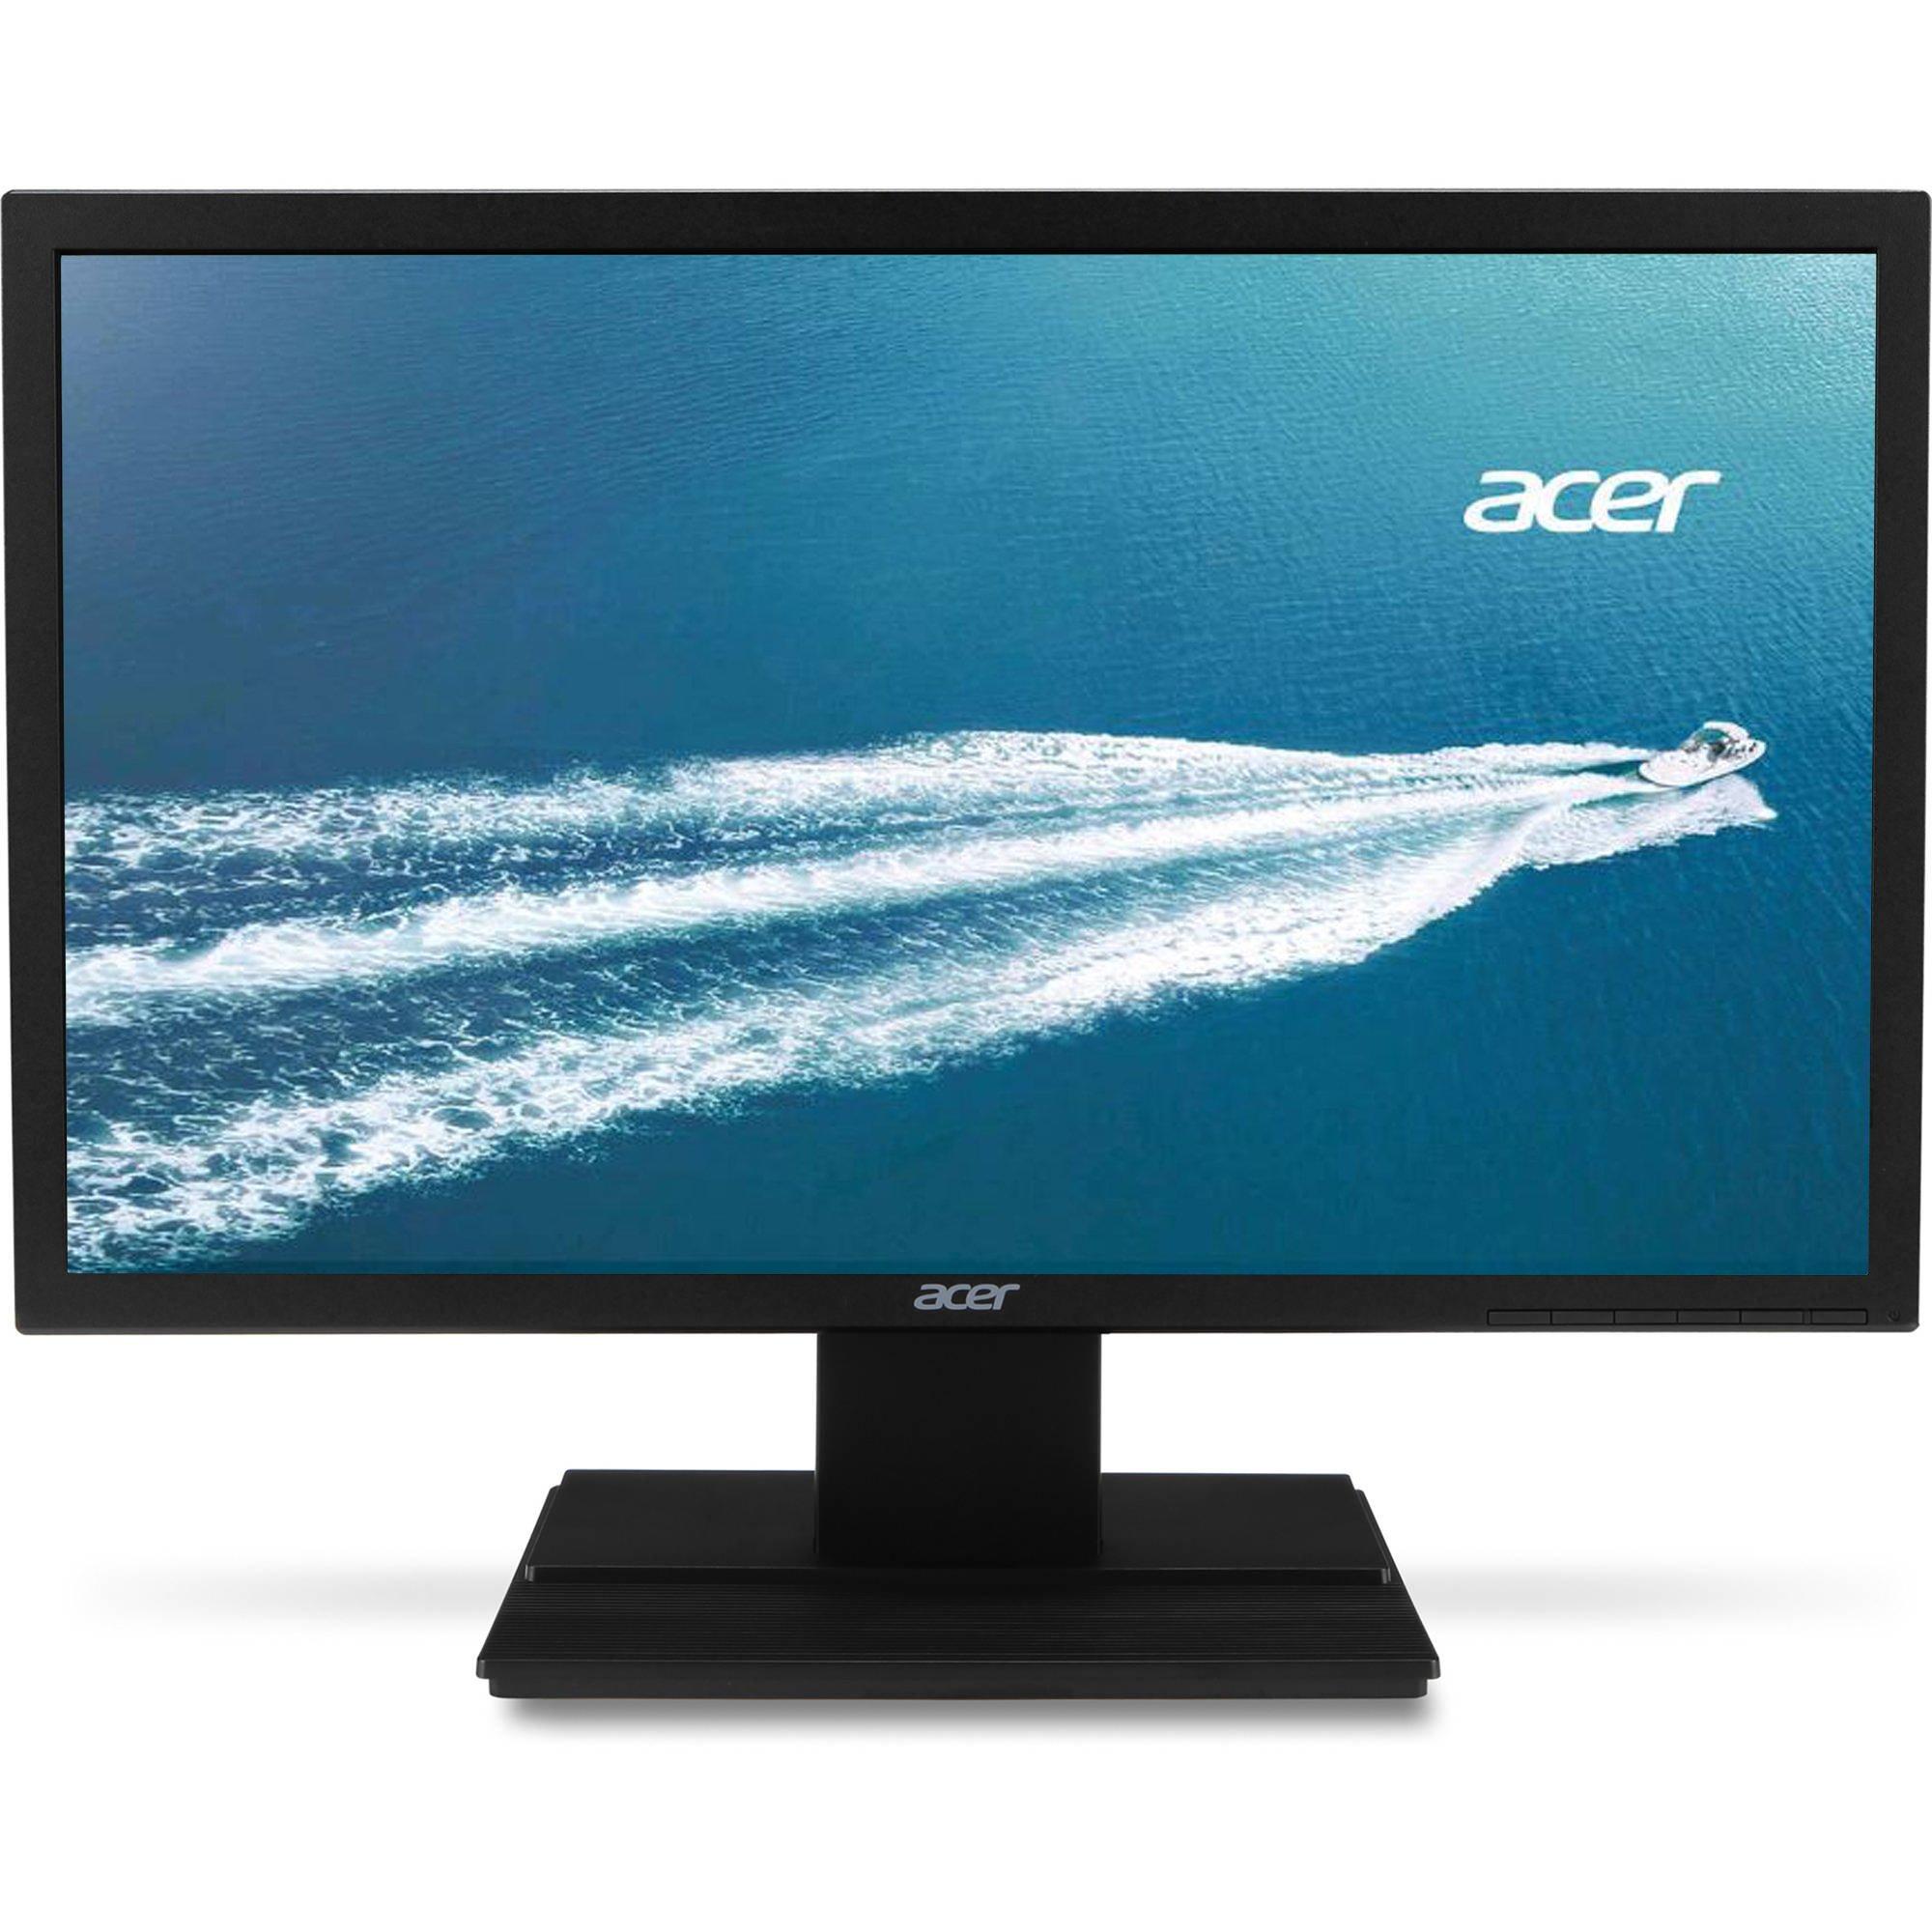 Acer Display 24'' Full HD, Anti-glare , TN Film, 1920 x 1080 , 60 Hz |V246HLBD (Certified Refurbished)